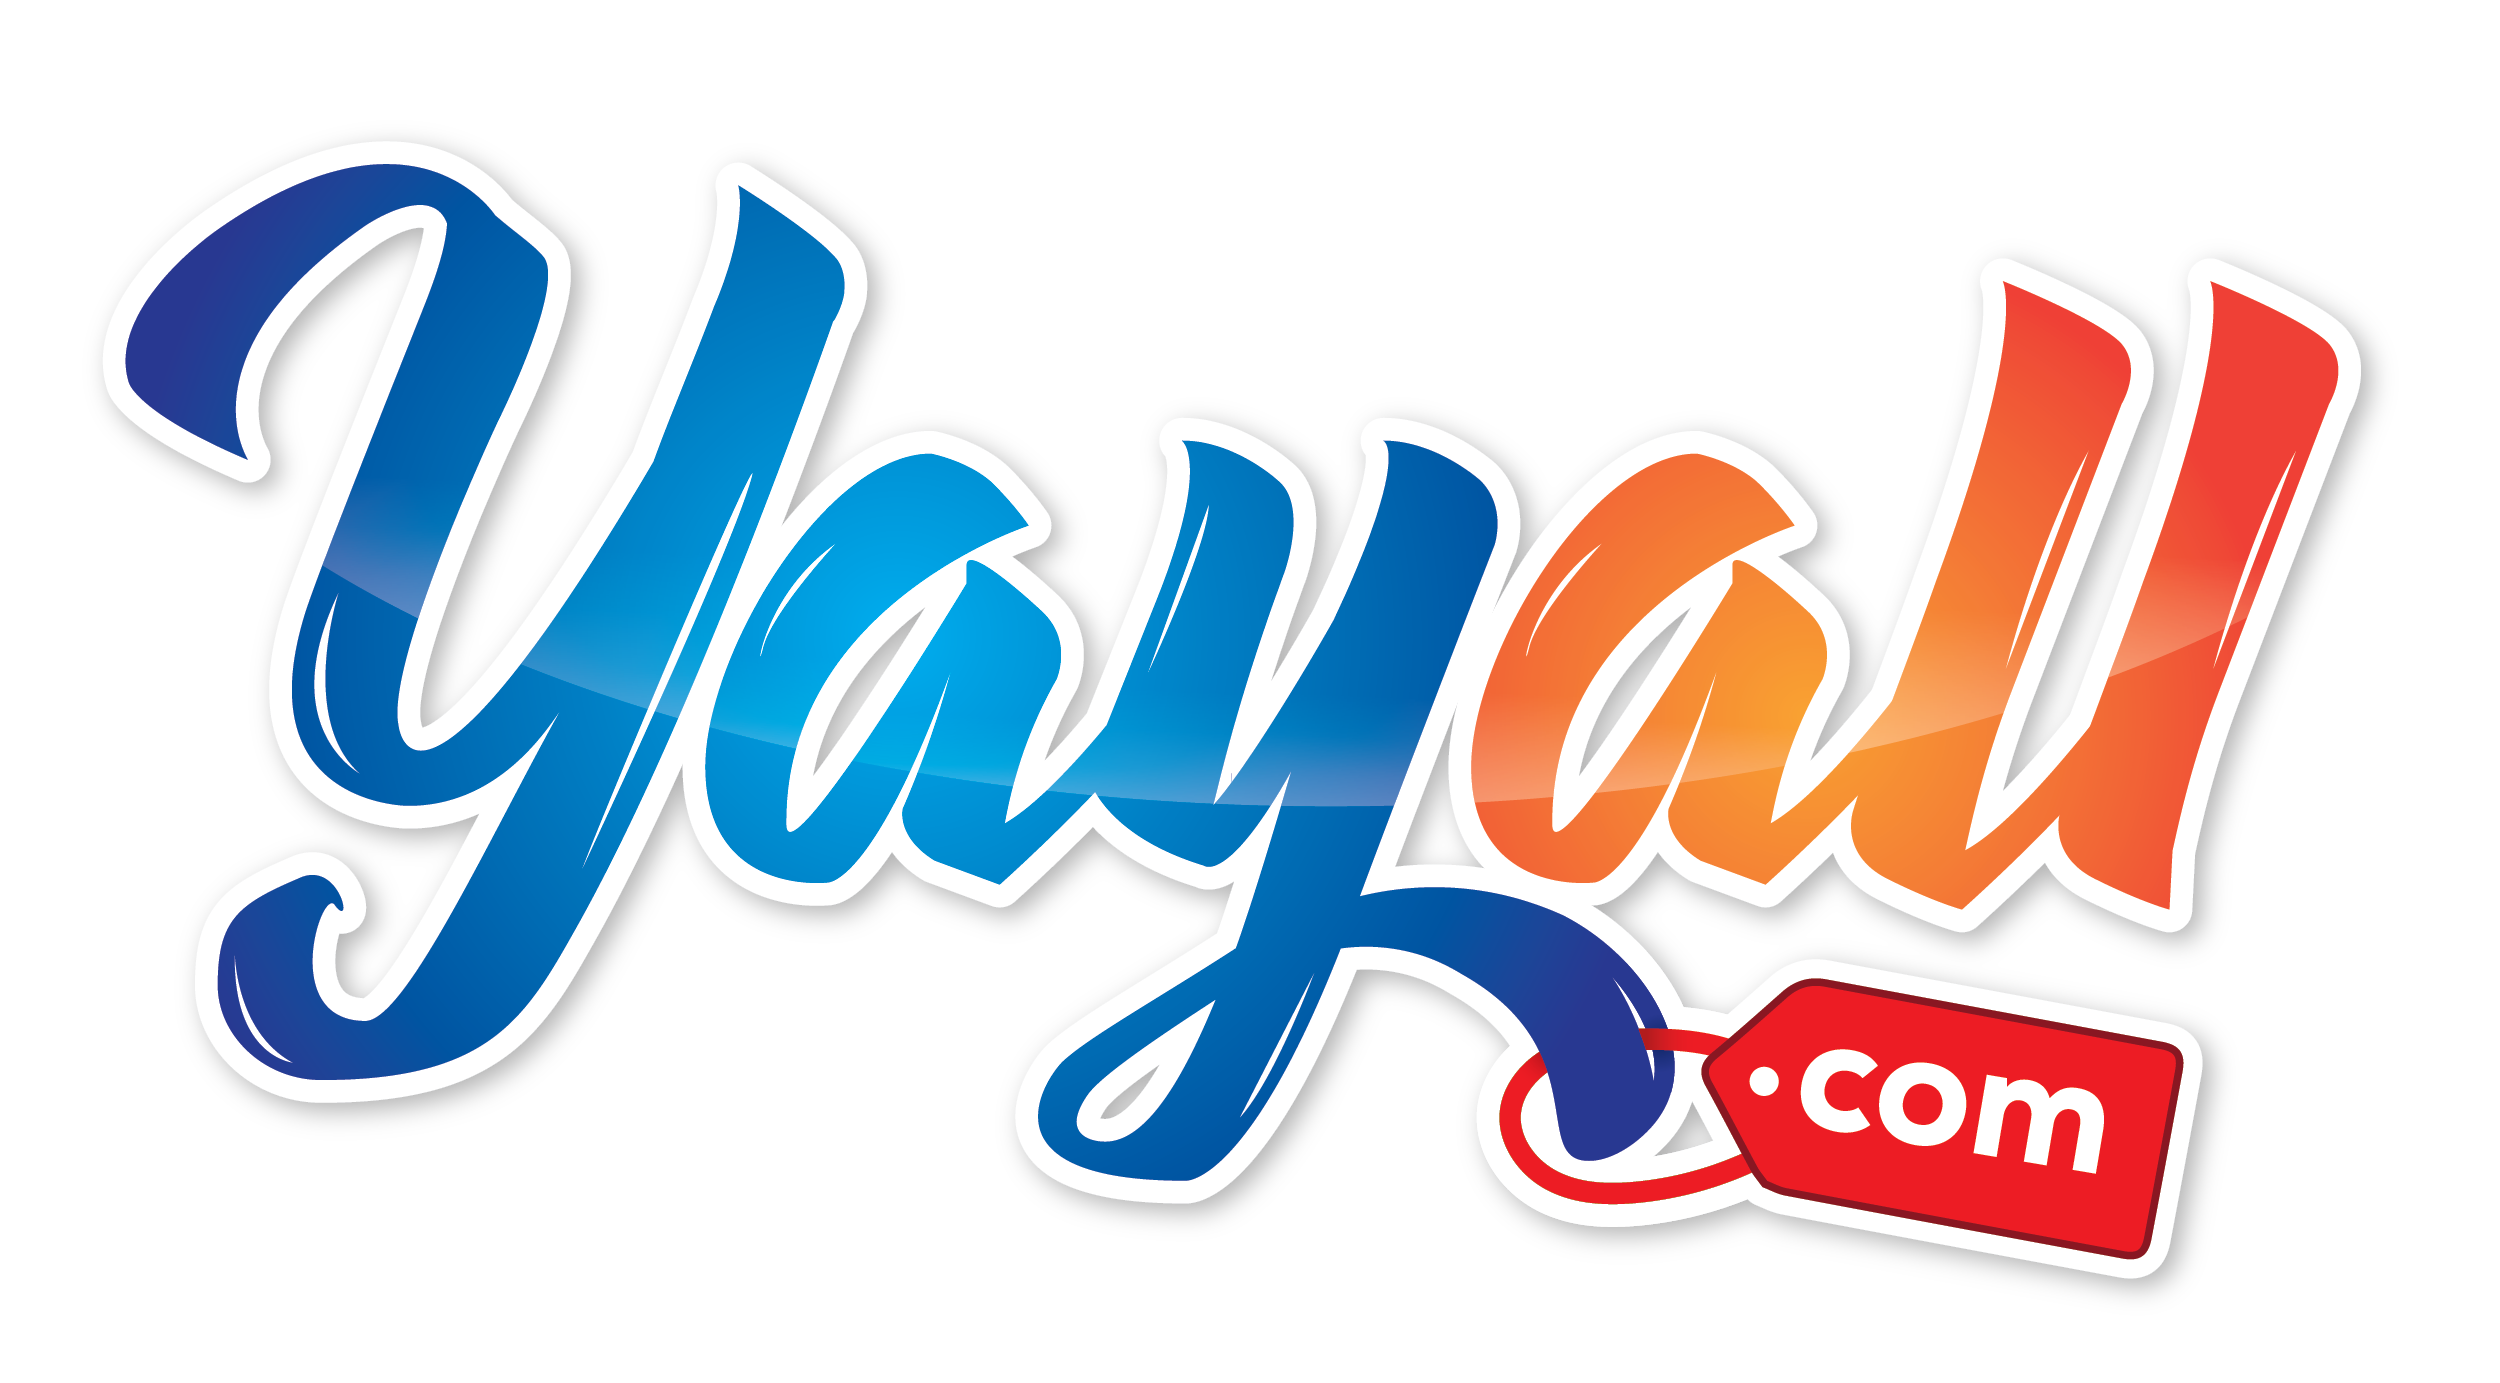 I brandable logo for website YAYALL.COM